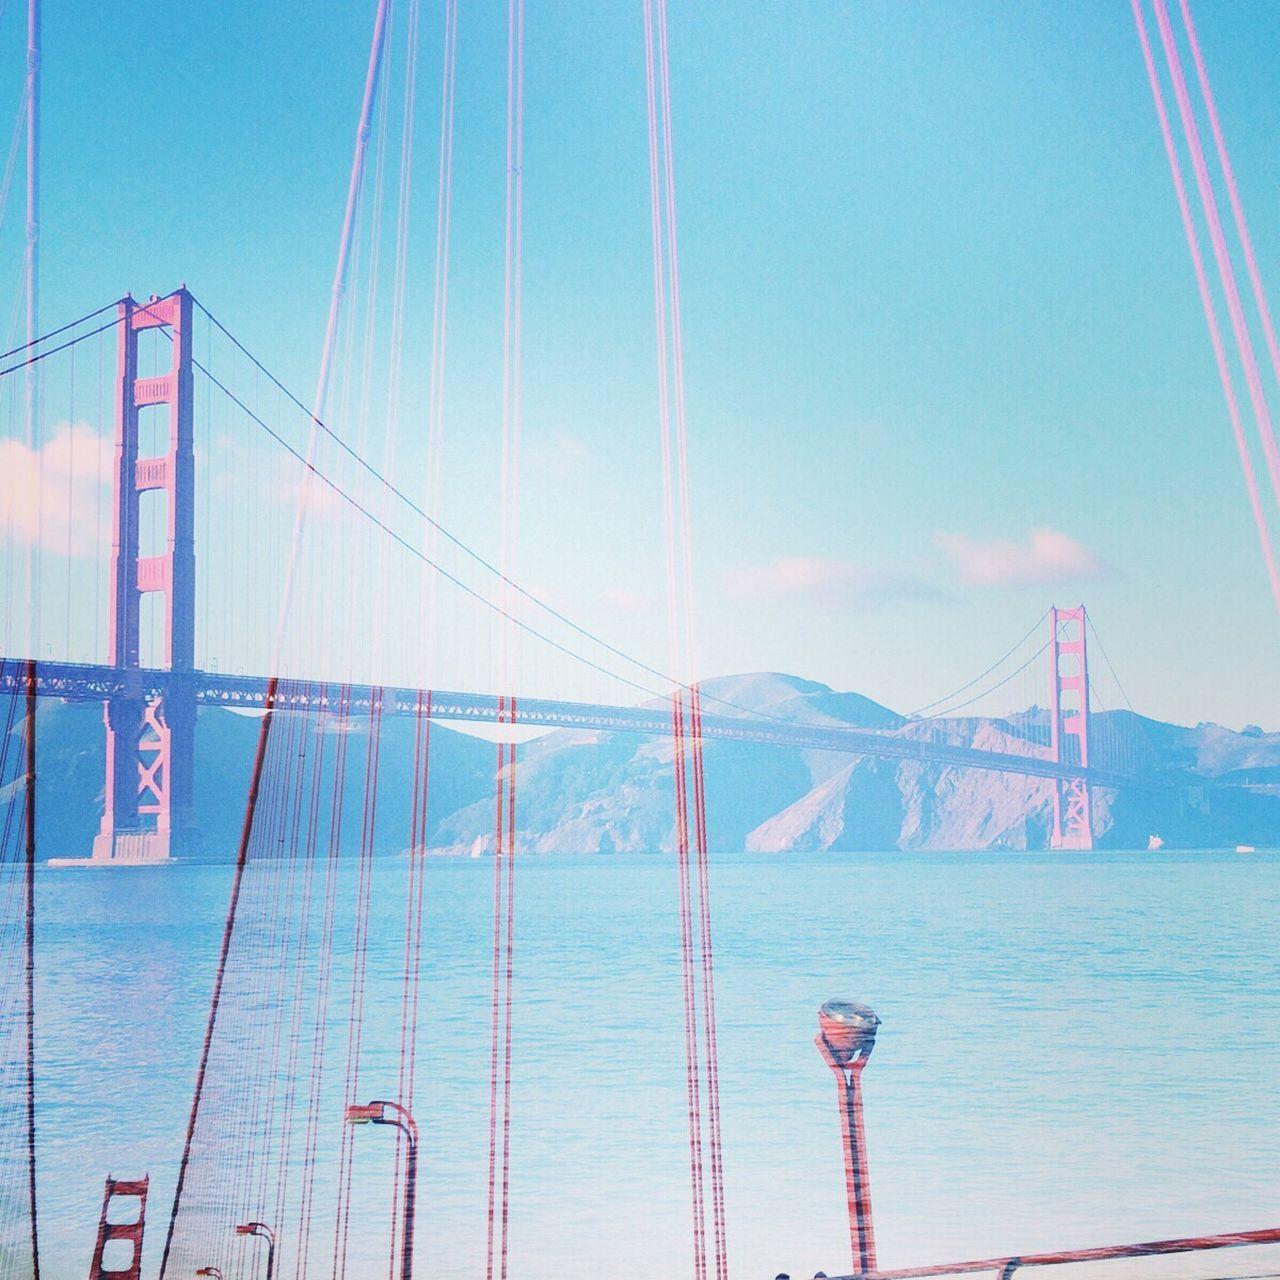 San Francisco GoldenGateBridge Enjoying Life